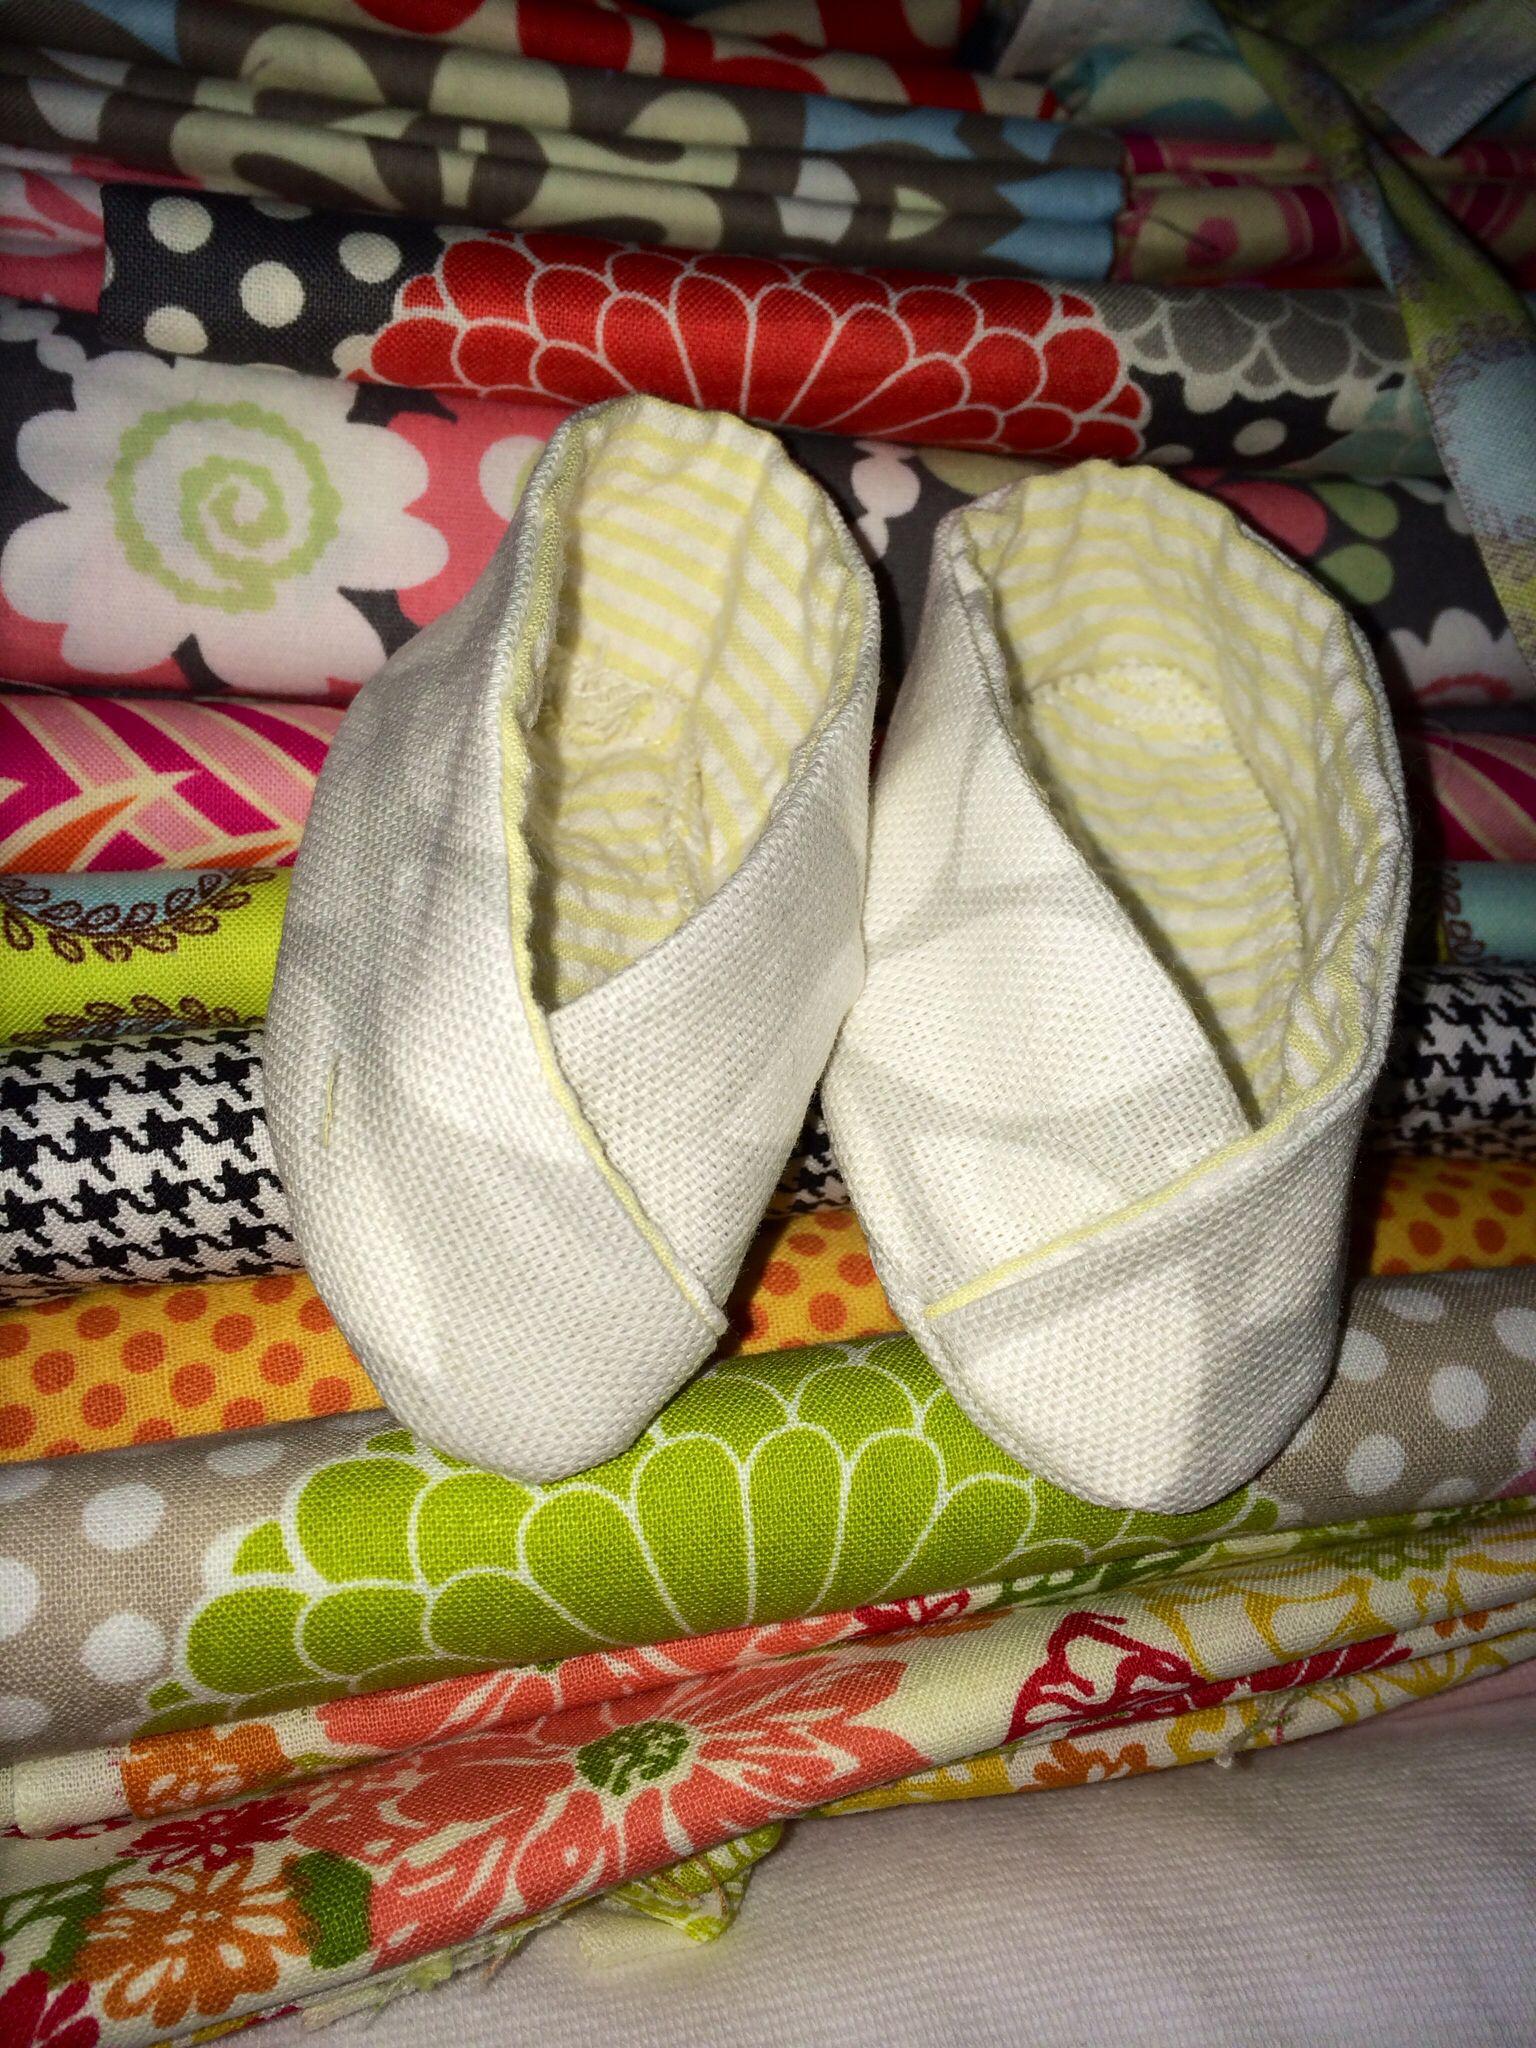 Kimono baby shoes by Sylvia Carroll designs